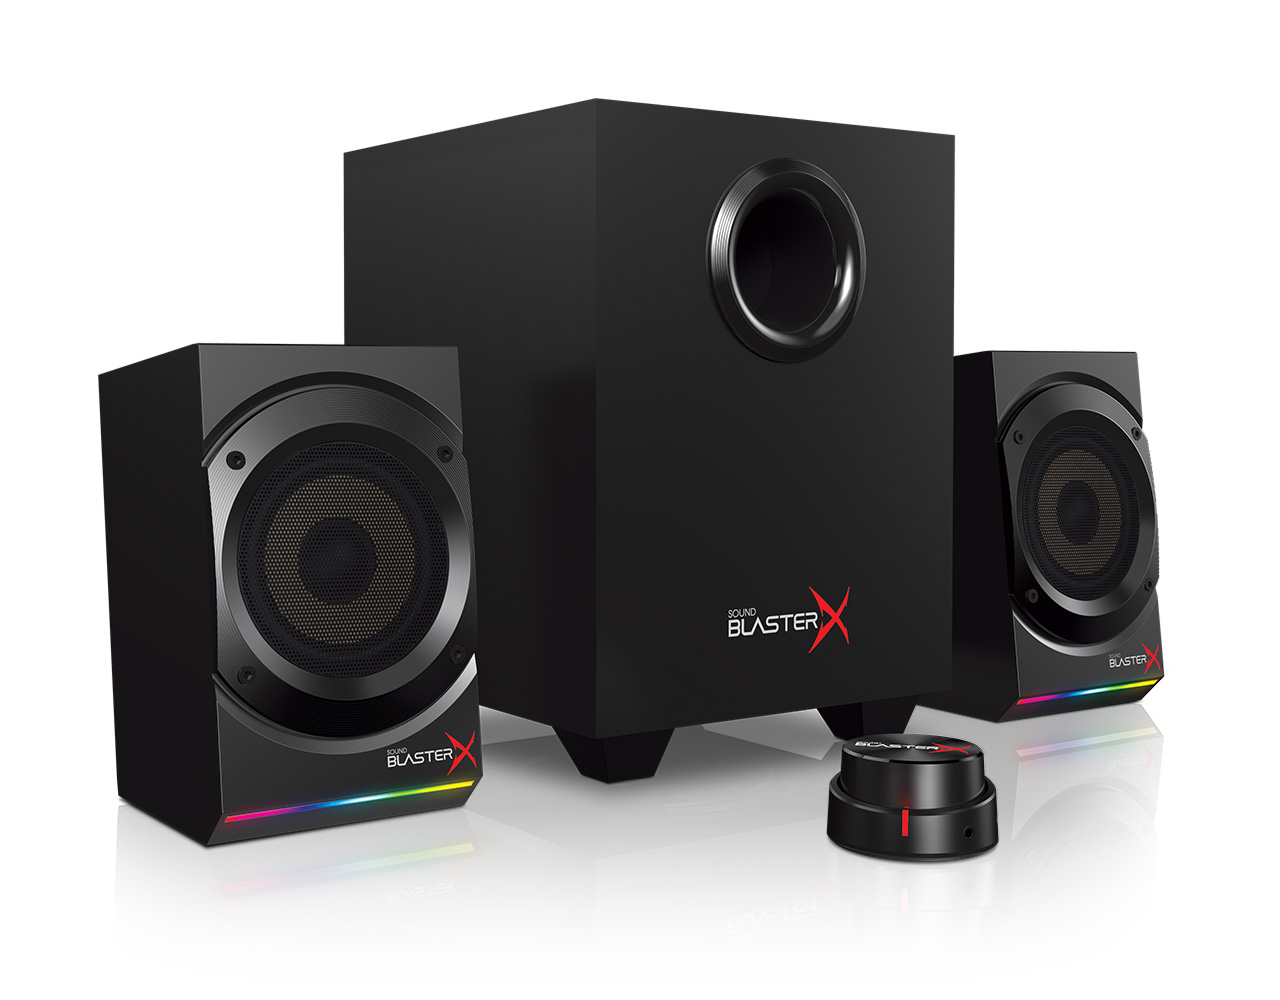 creative crv 51mf0470aa002 2 1 channel sound blasterx. Black Bedroom Furniture Sets. Home Design Ideas